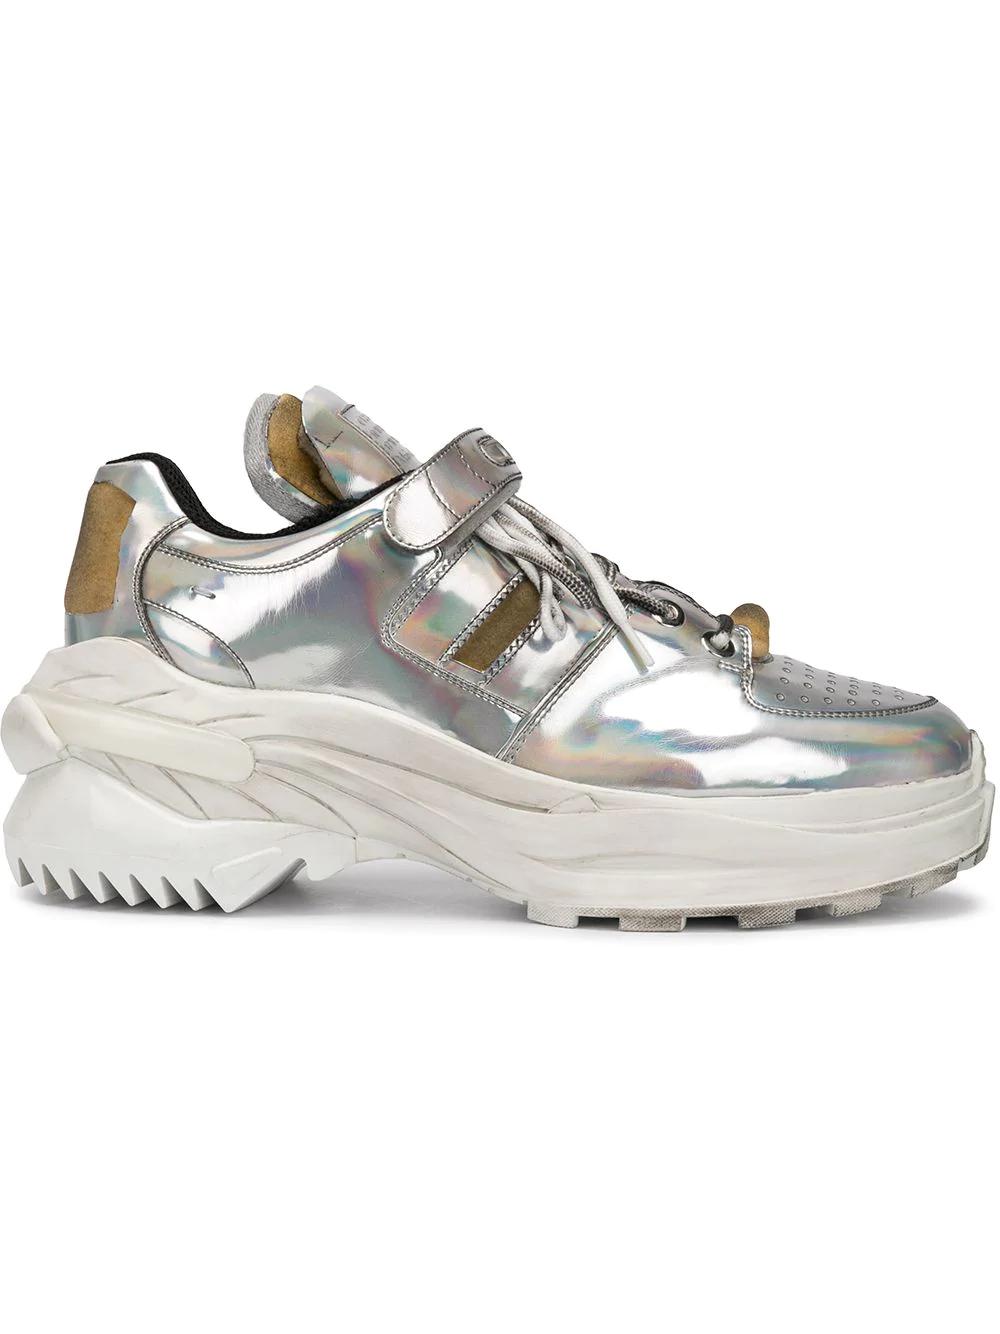 Silver Maison Fit Retro Margiela Sneakers 4Ajqc35RLS